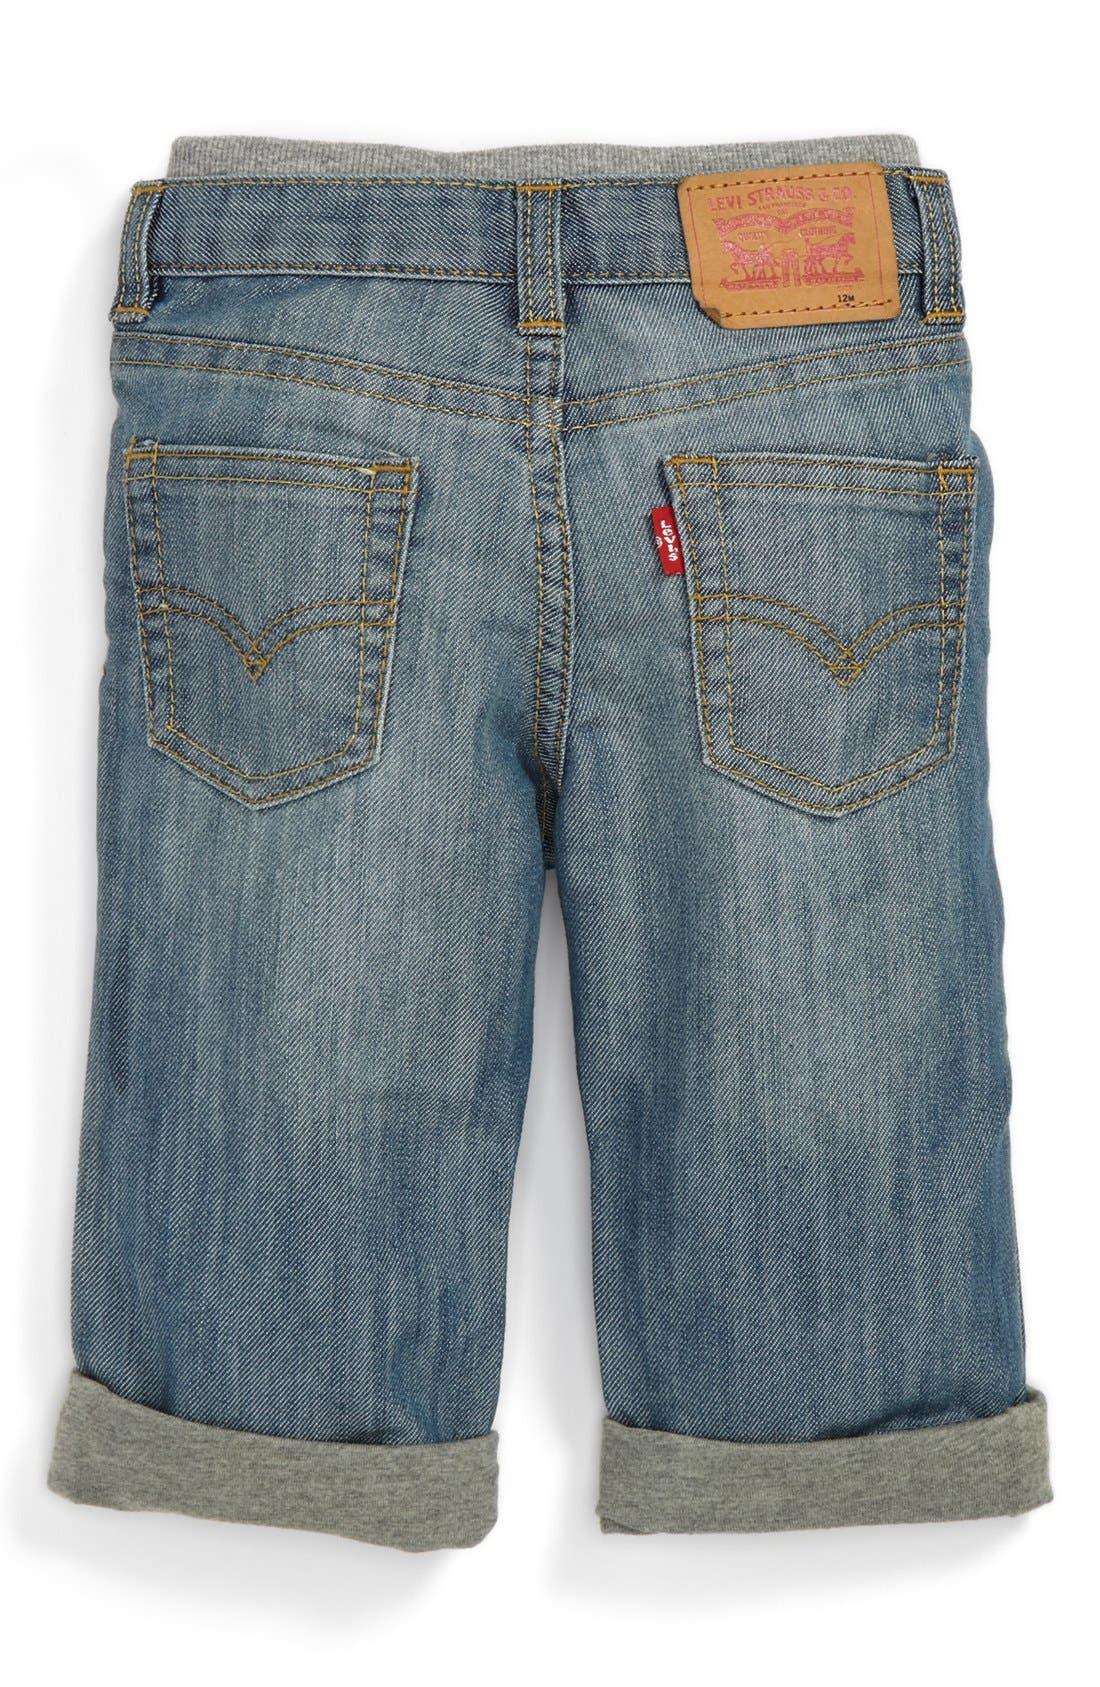 Main Image - Levi's '514™' Straight Leg Jeans (Toddler Boys)